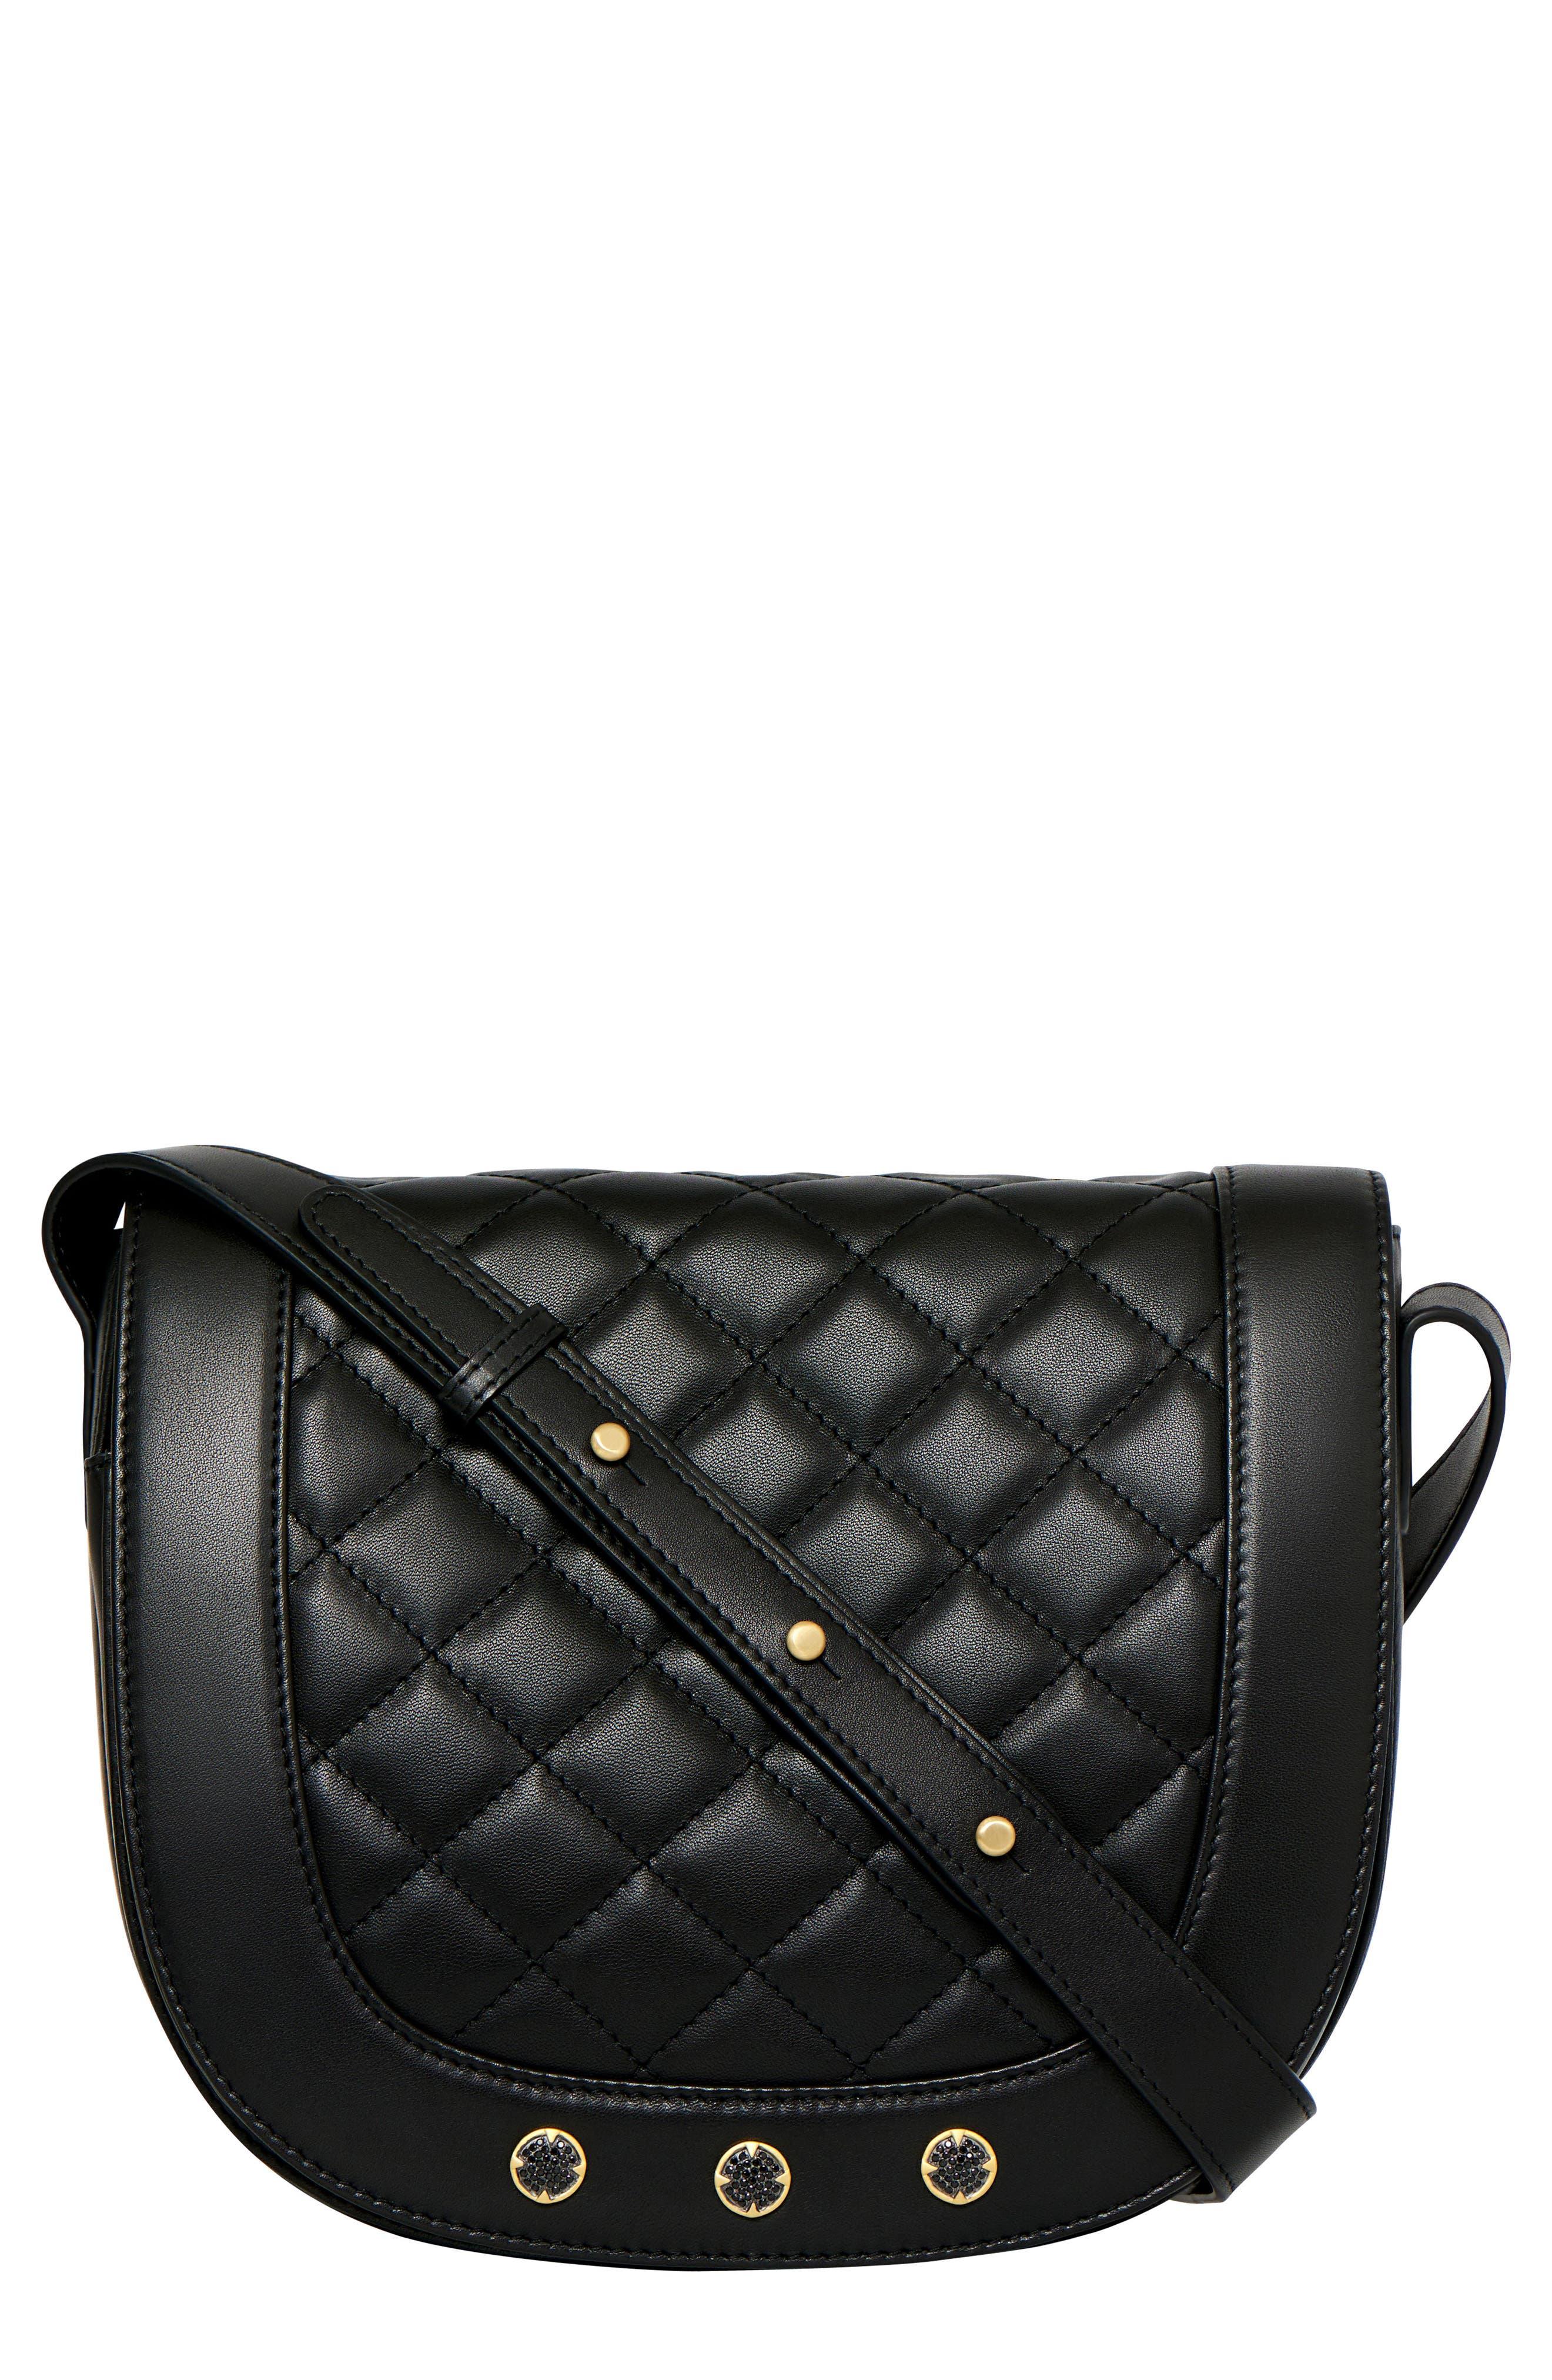 Bleeker Quilted Leather Messenger Bag,                         Main,                         color, Black